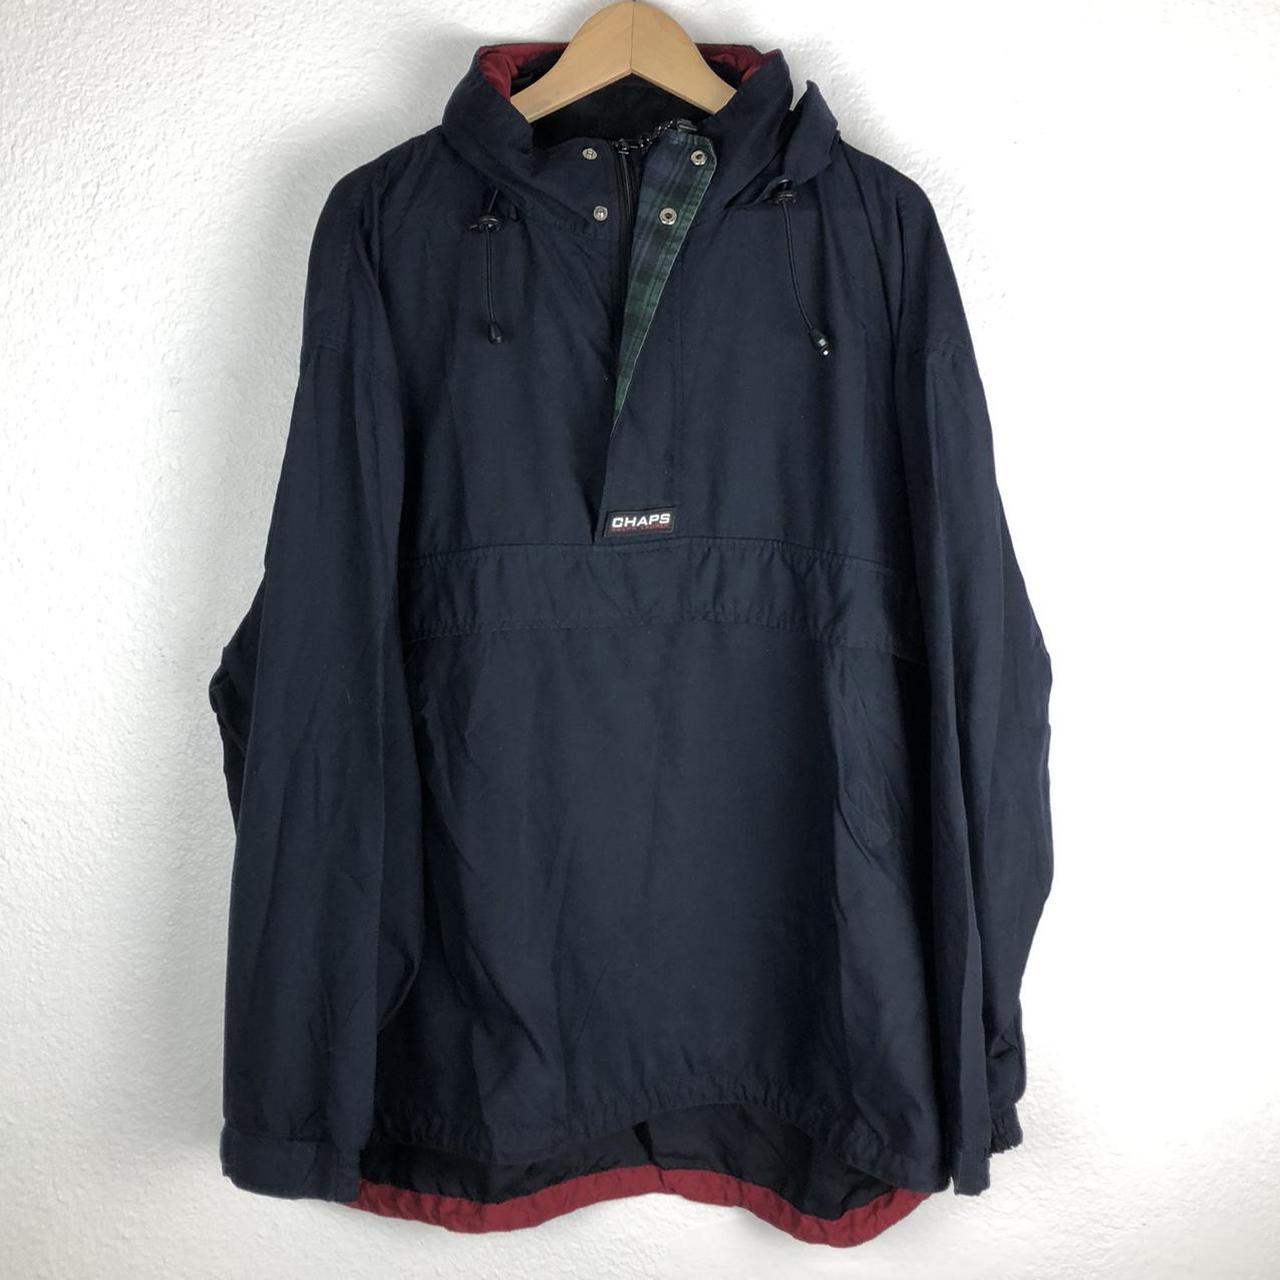 Product Image 1 - Chaps Ralph Lauren jacket  Condition